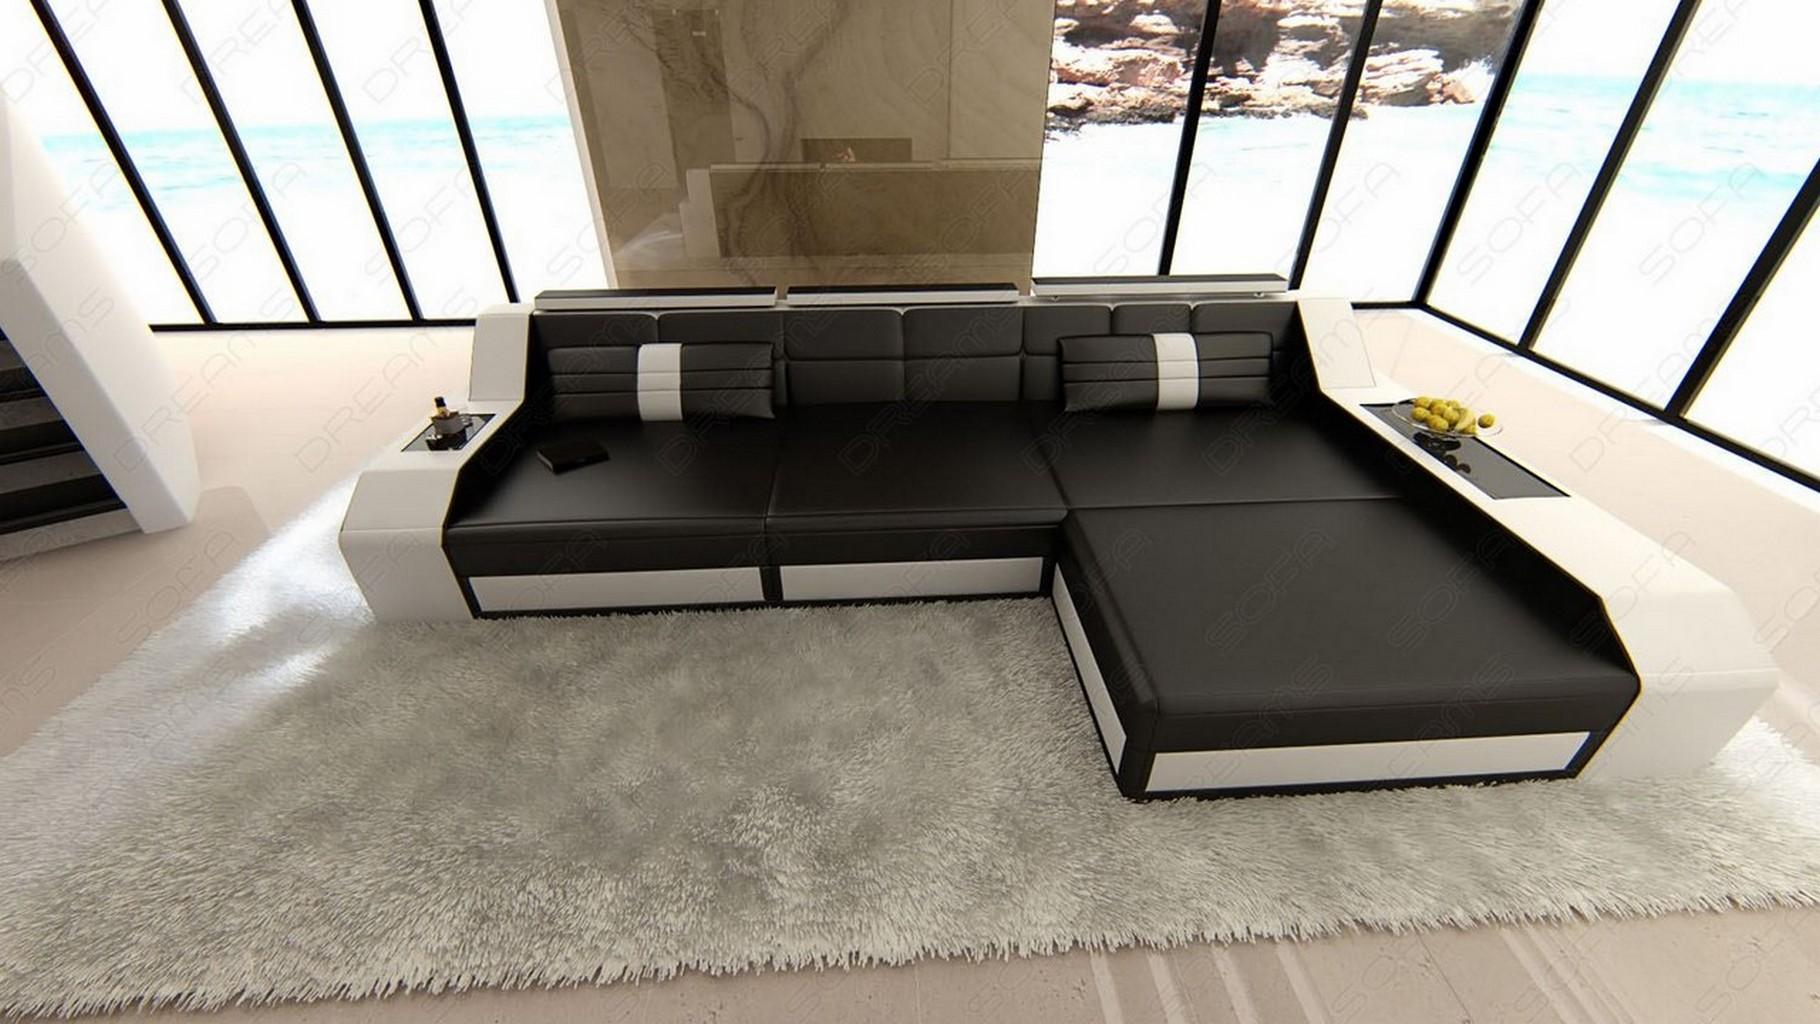 ledersofa arezzo l form eckcouch mit beleuchtung schwarz. Black Bedroom Furniture Sets. Home Design Ideas